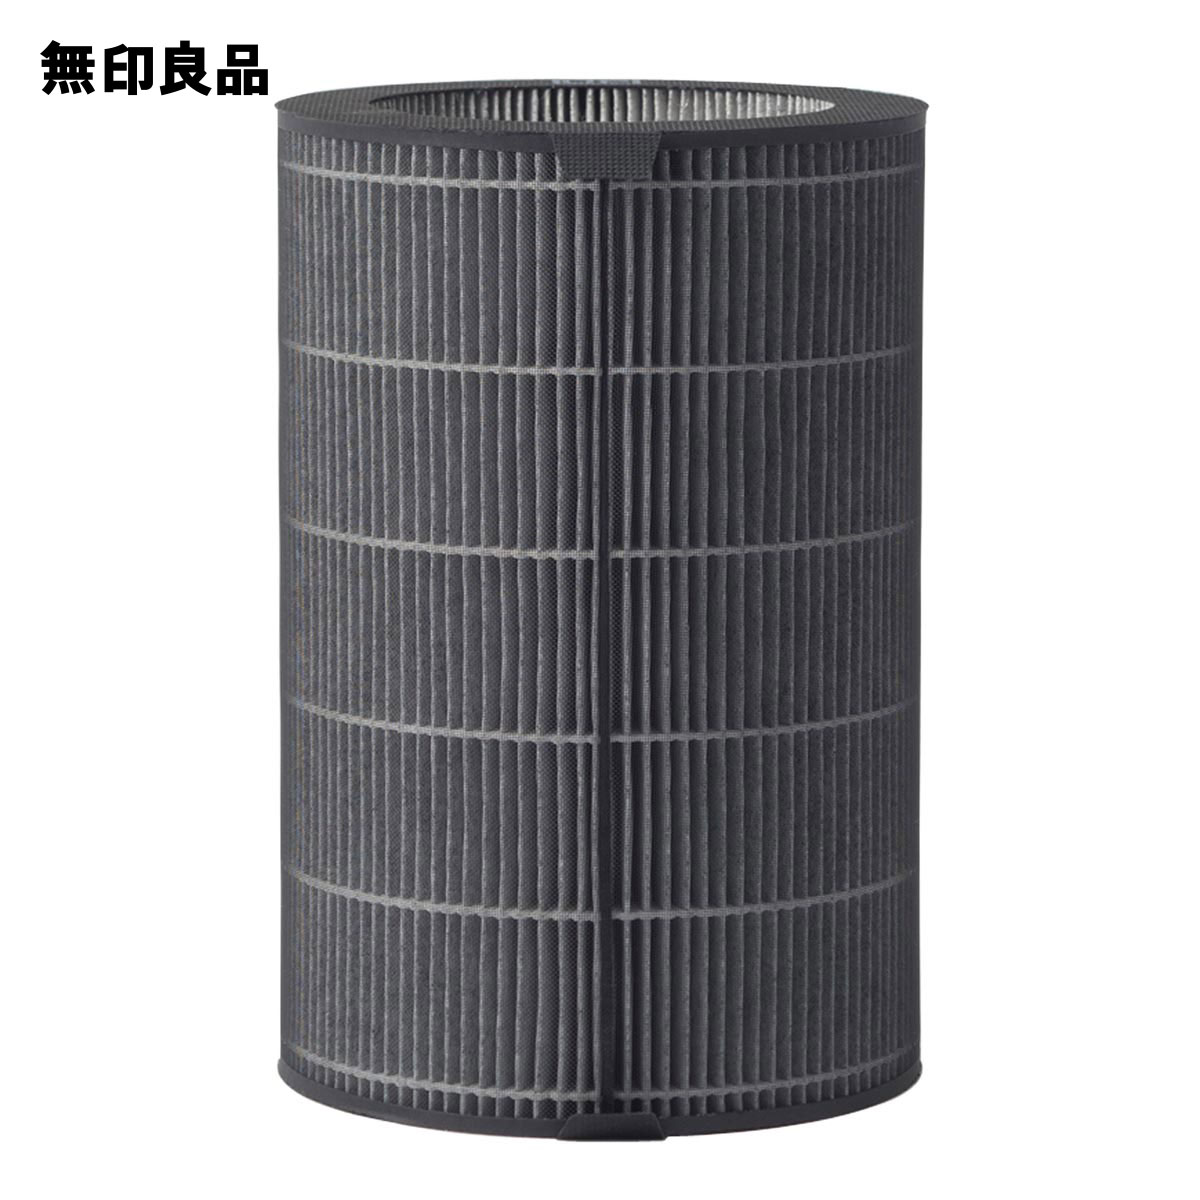 無印良品 空気清浄機用 360°集塵脱臭フィルター型番:MJ‐AP1‐FL